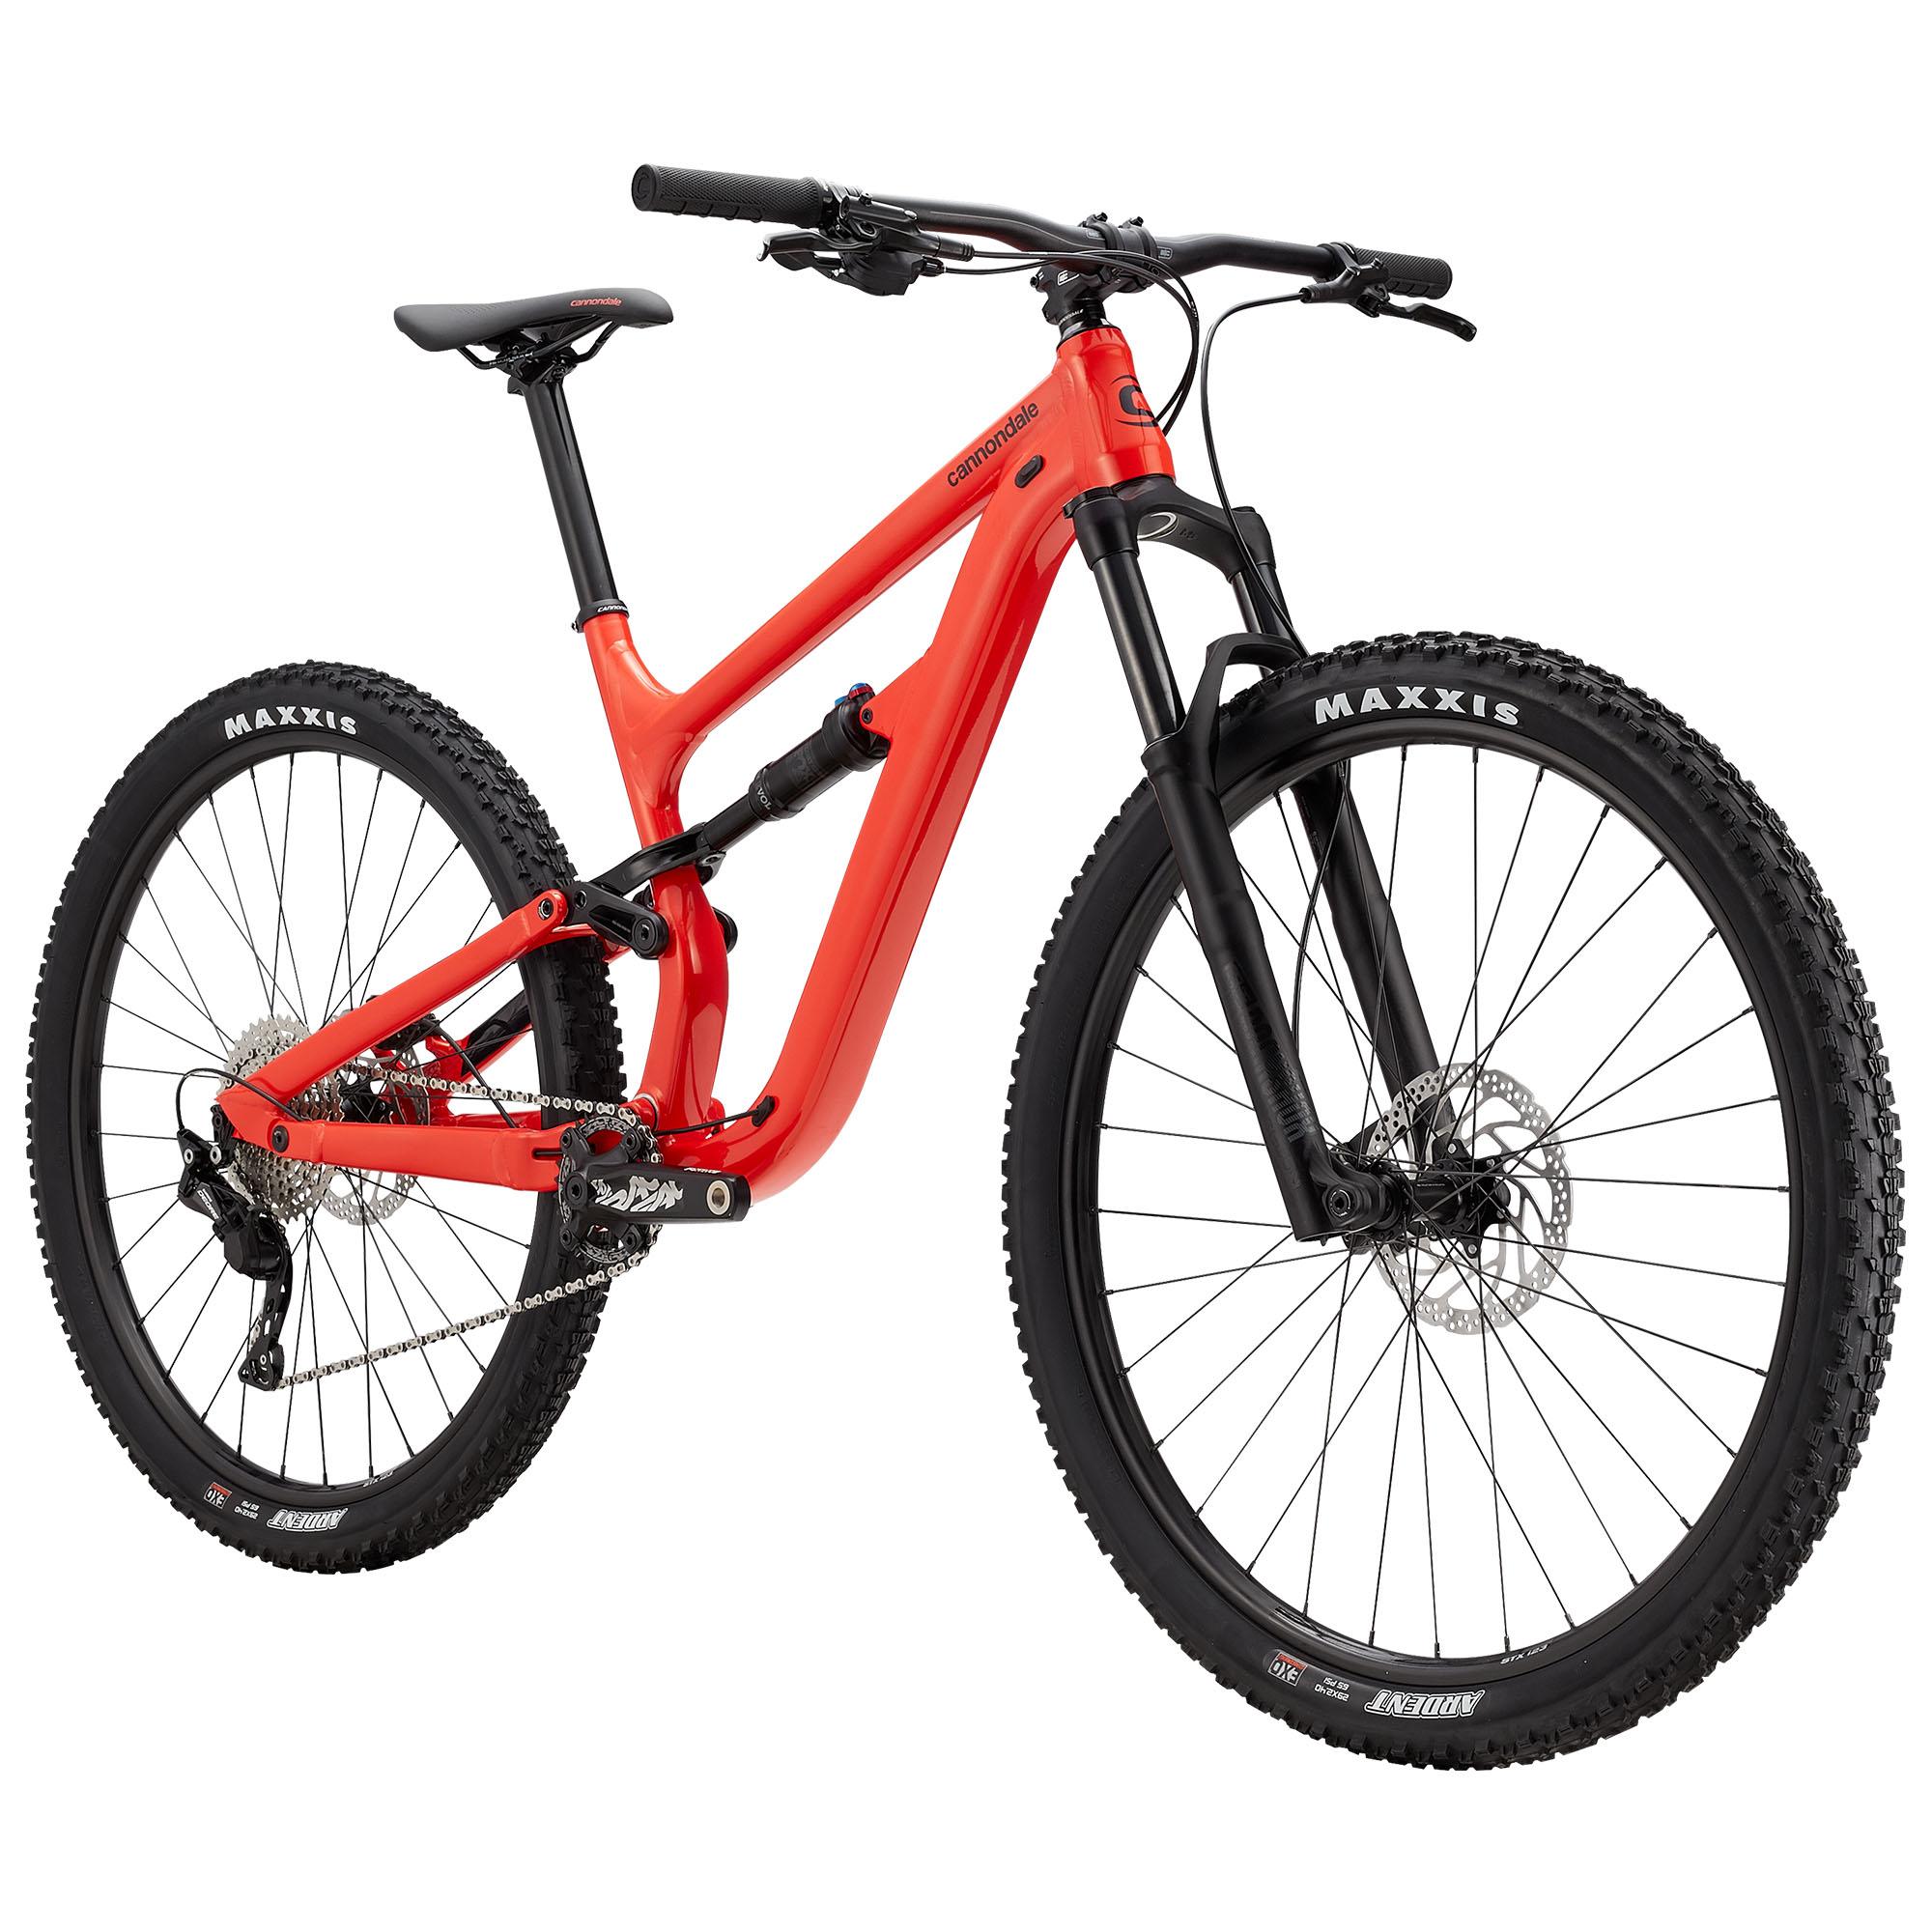 46eb4a18699 Cannondale Men's Habit 6 Mountain Bike '19 - Sun & Ski Sports